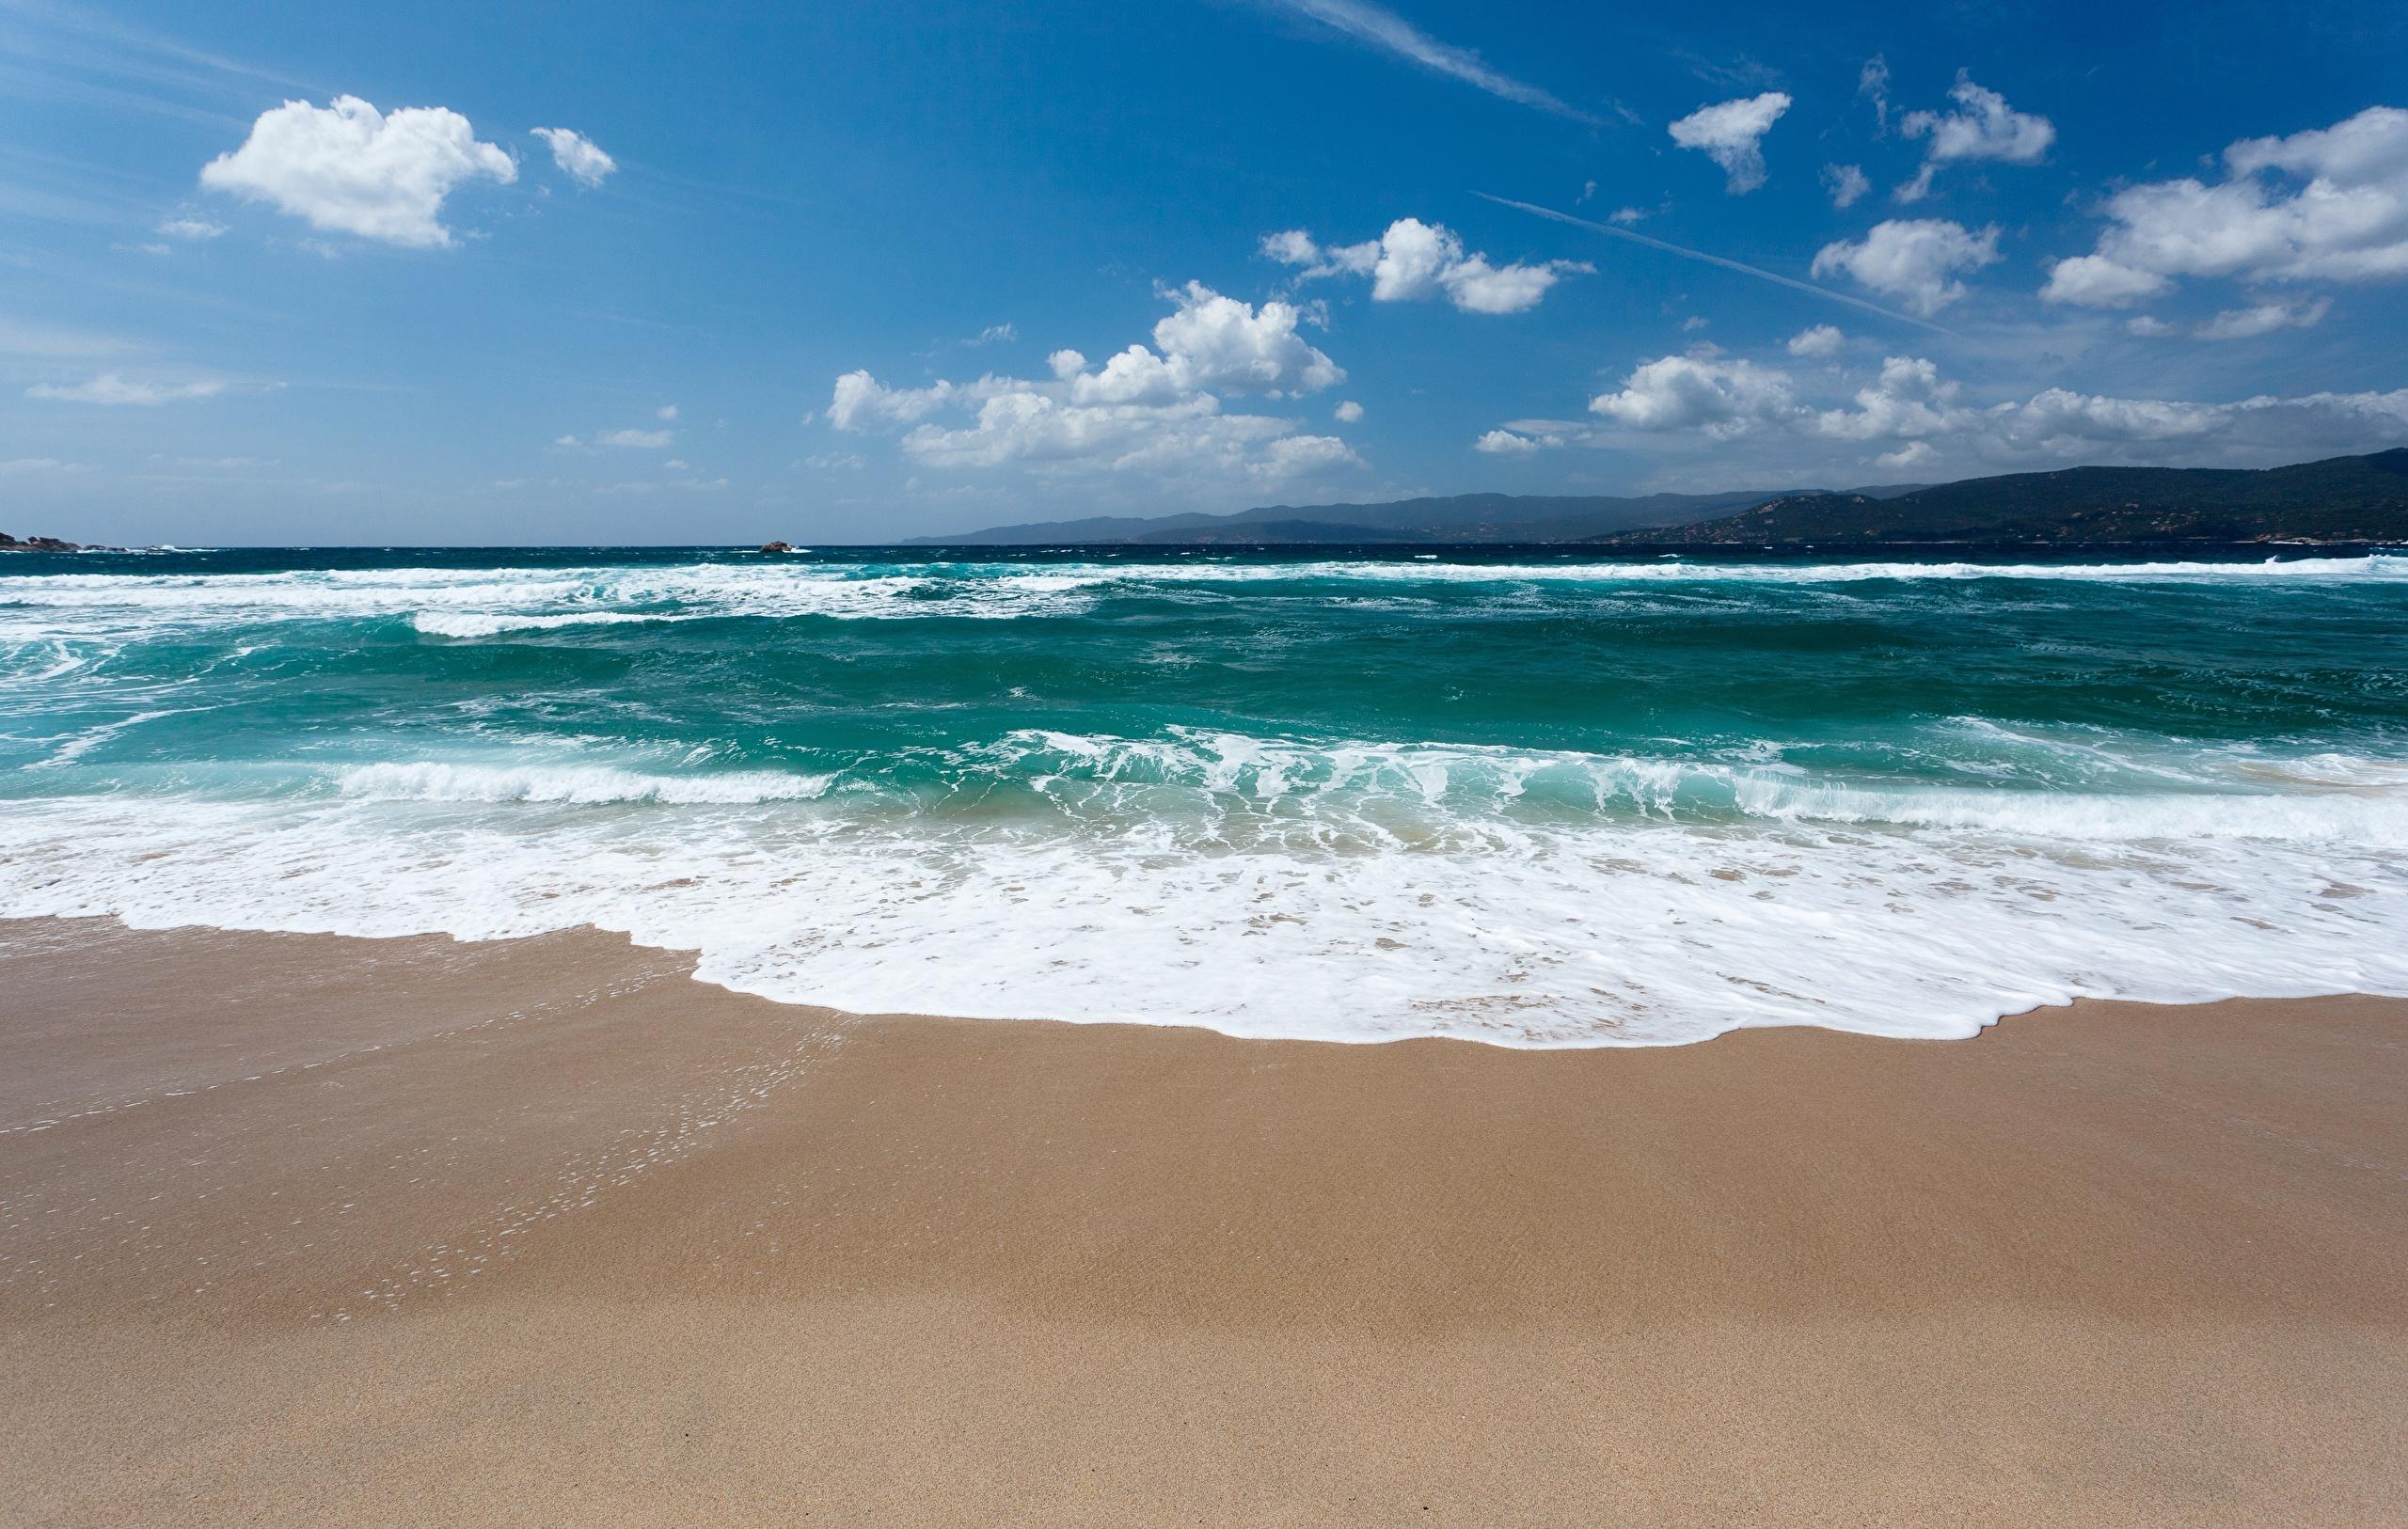 природа небо море песок берег бесплатно